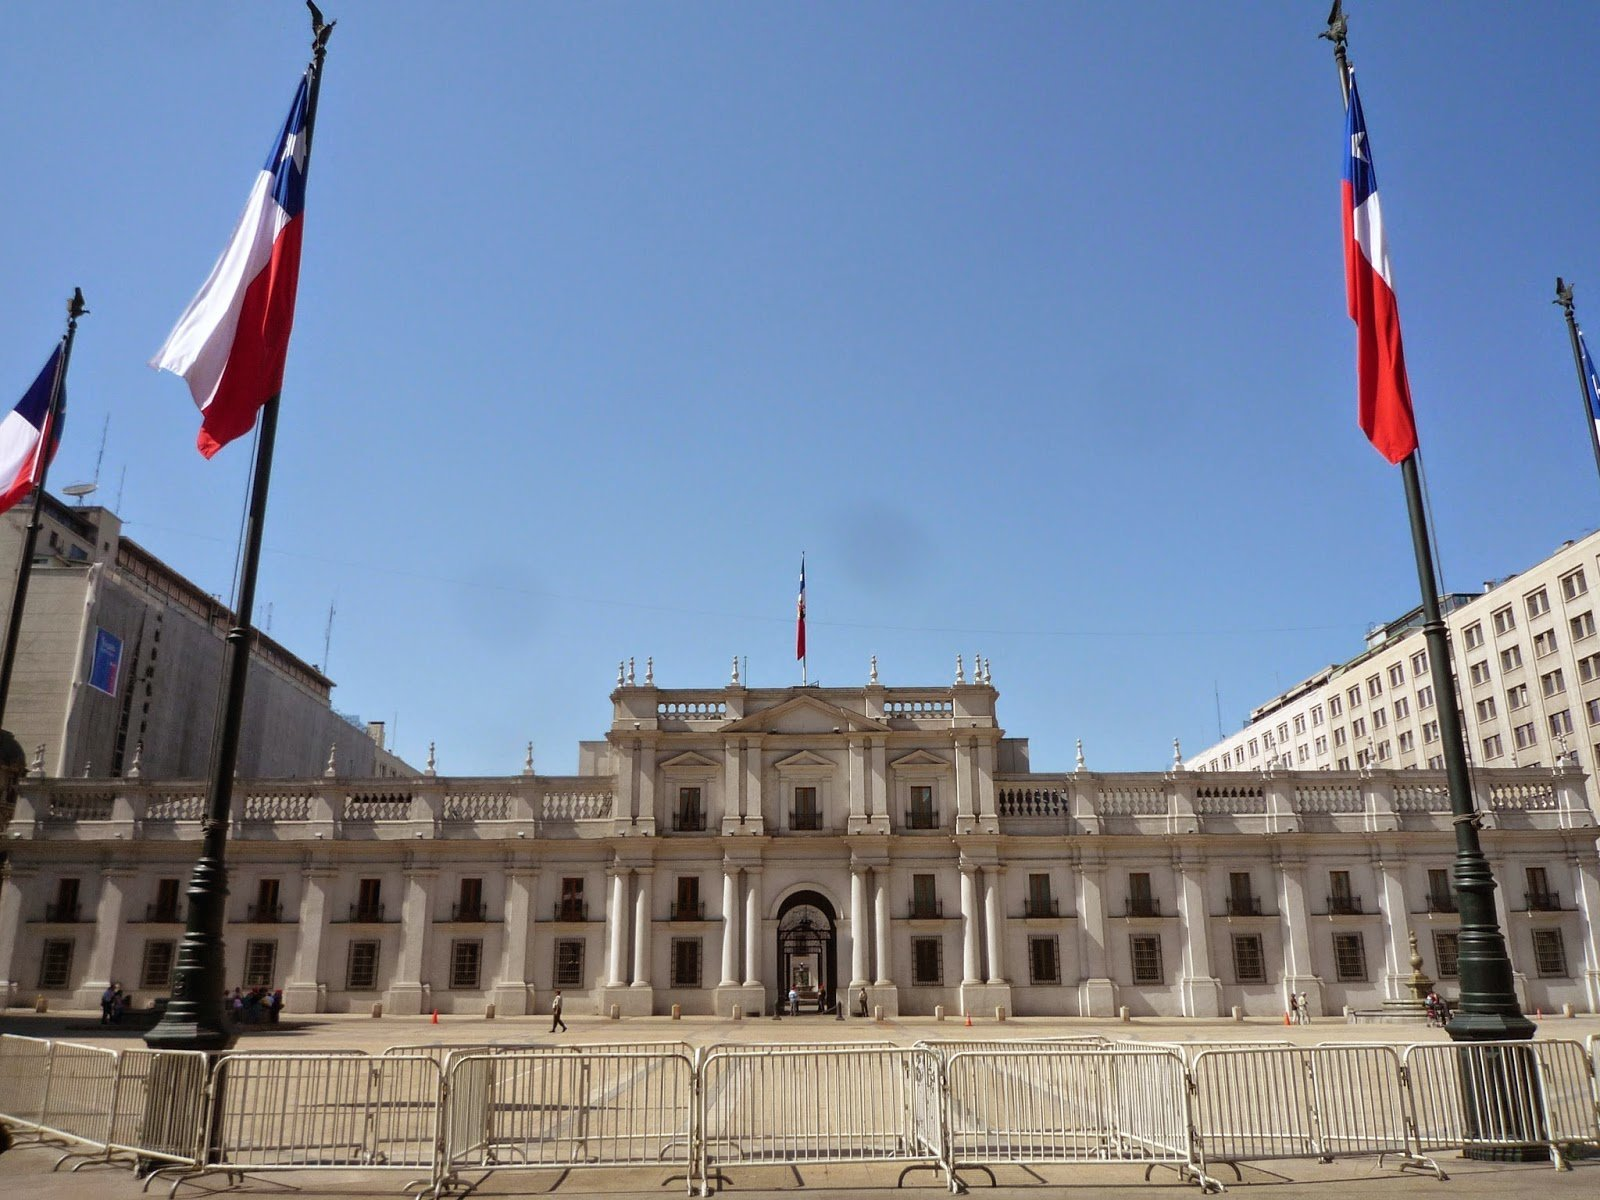 Santiago: uma visita ao Palácio de La Moneda